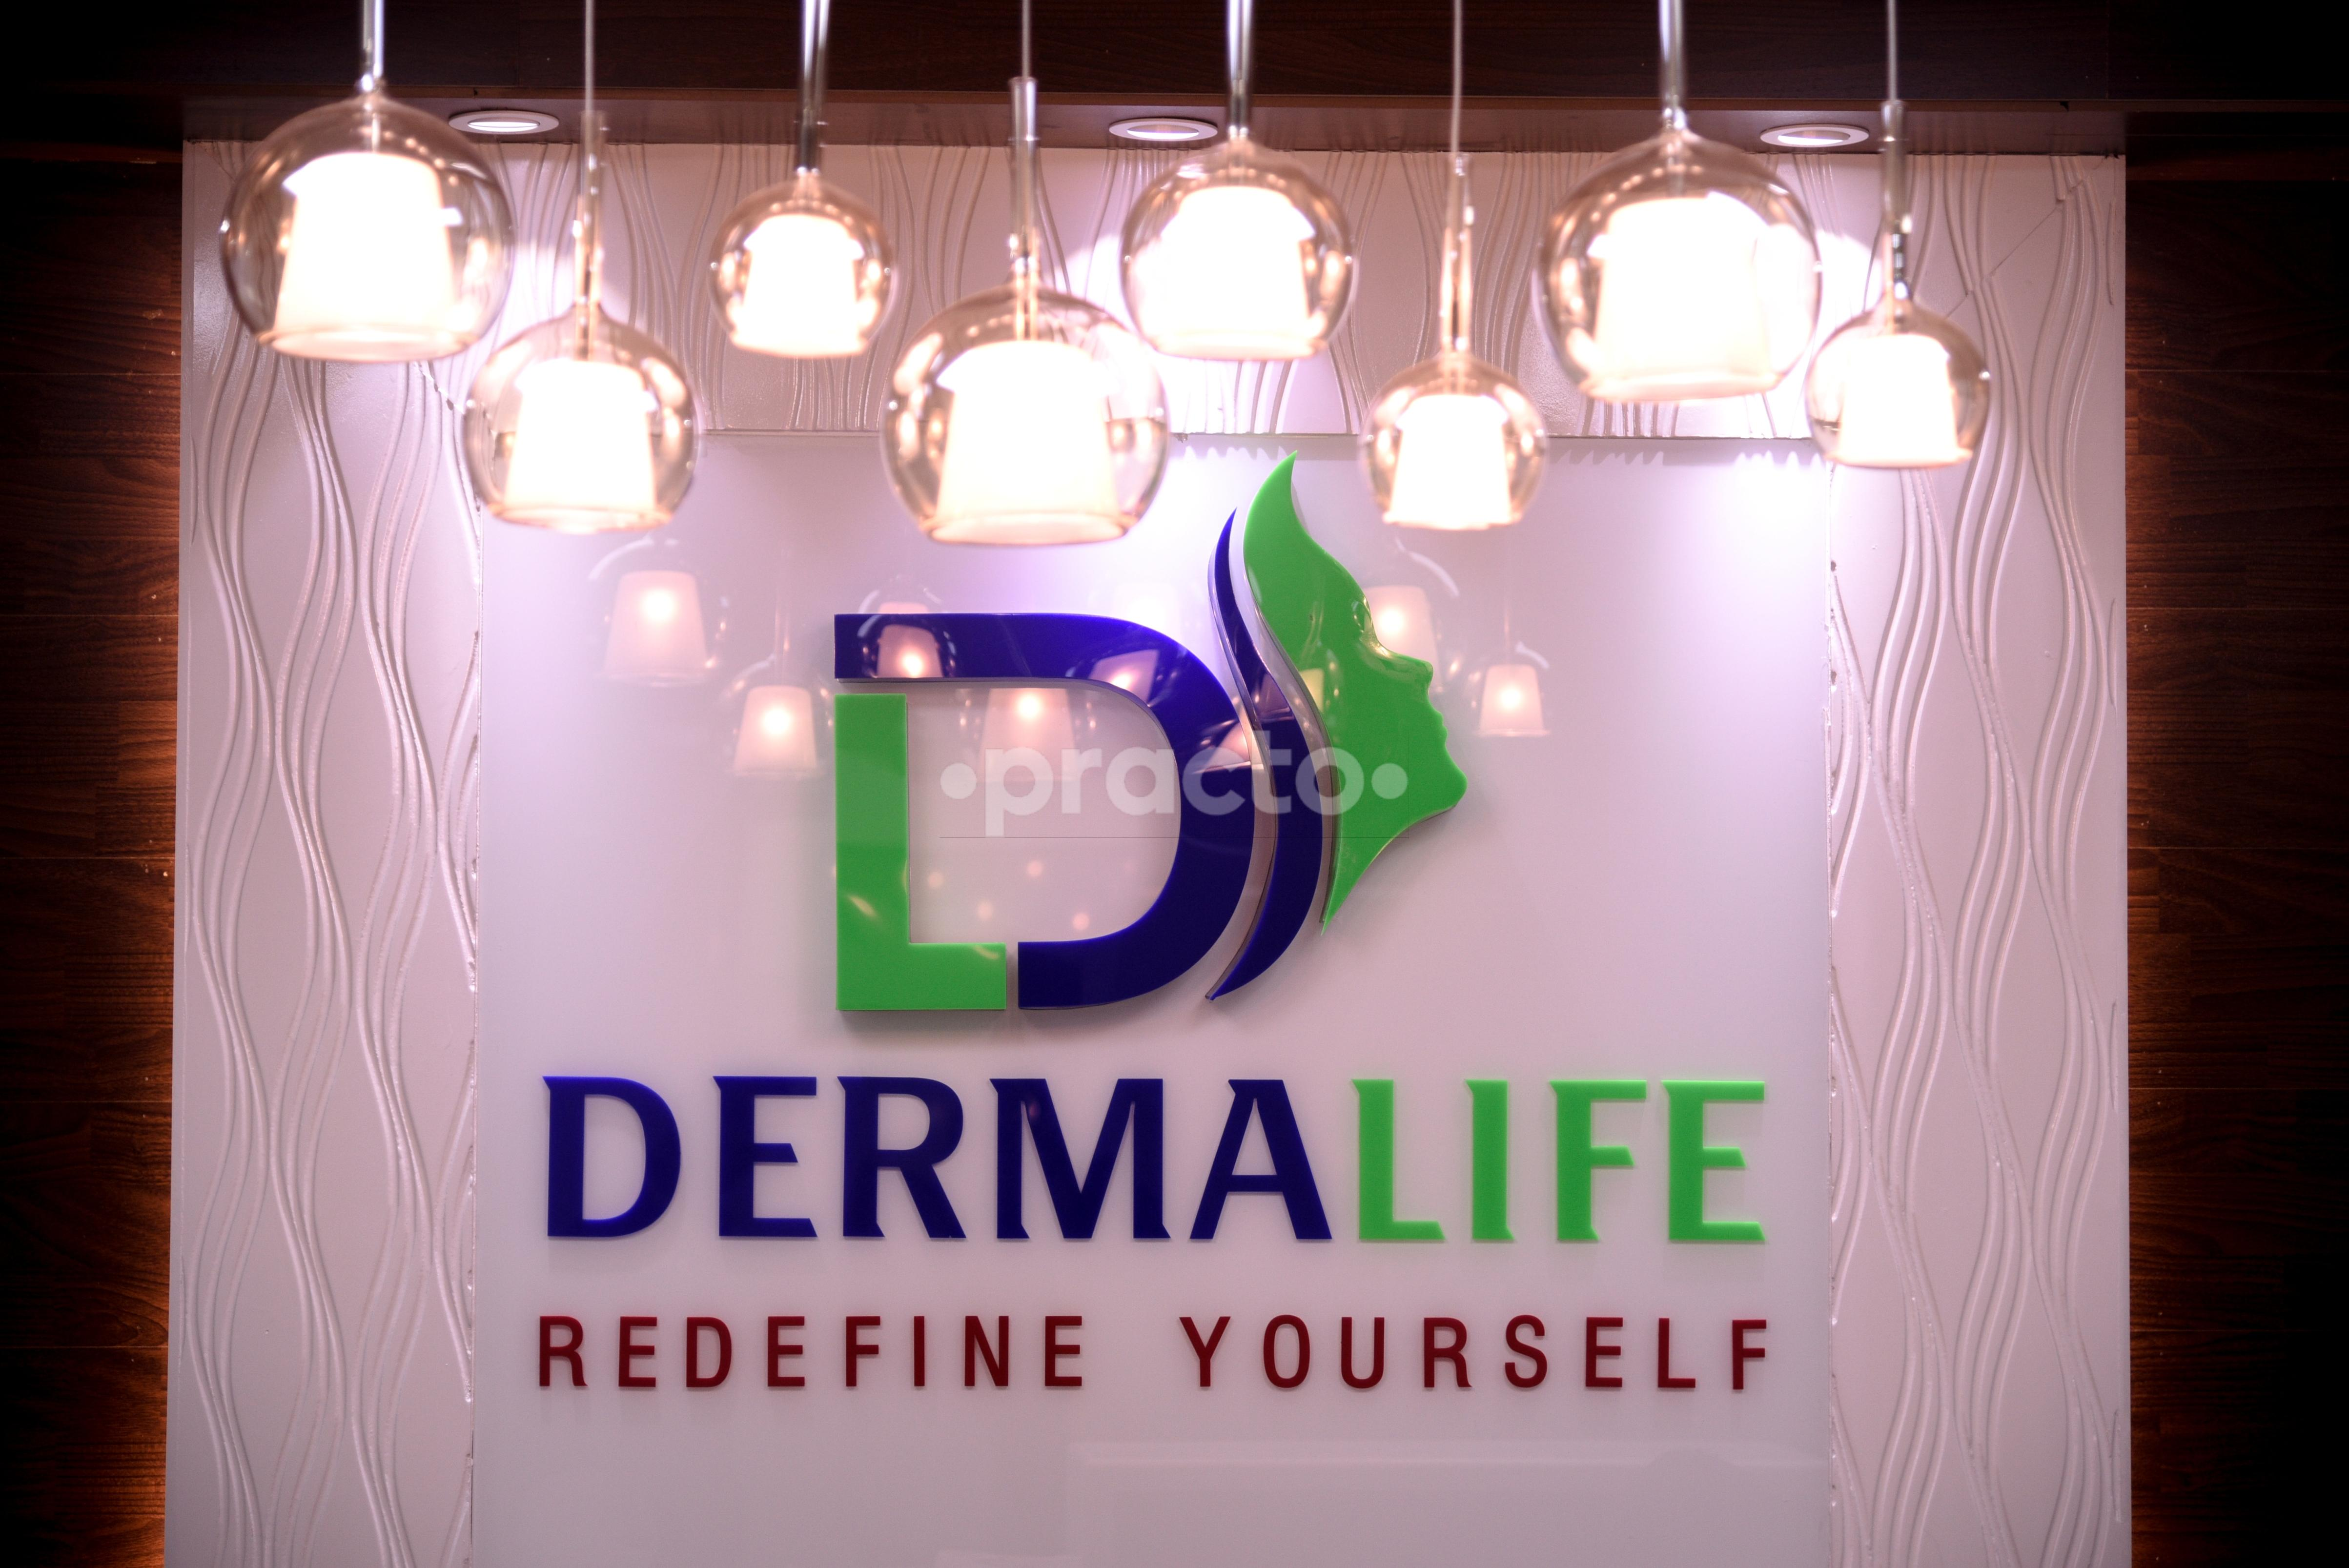 Dermalife Skin Hair Clinic